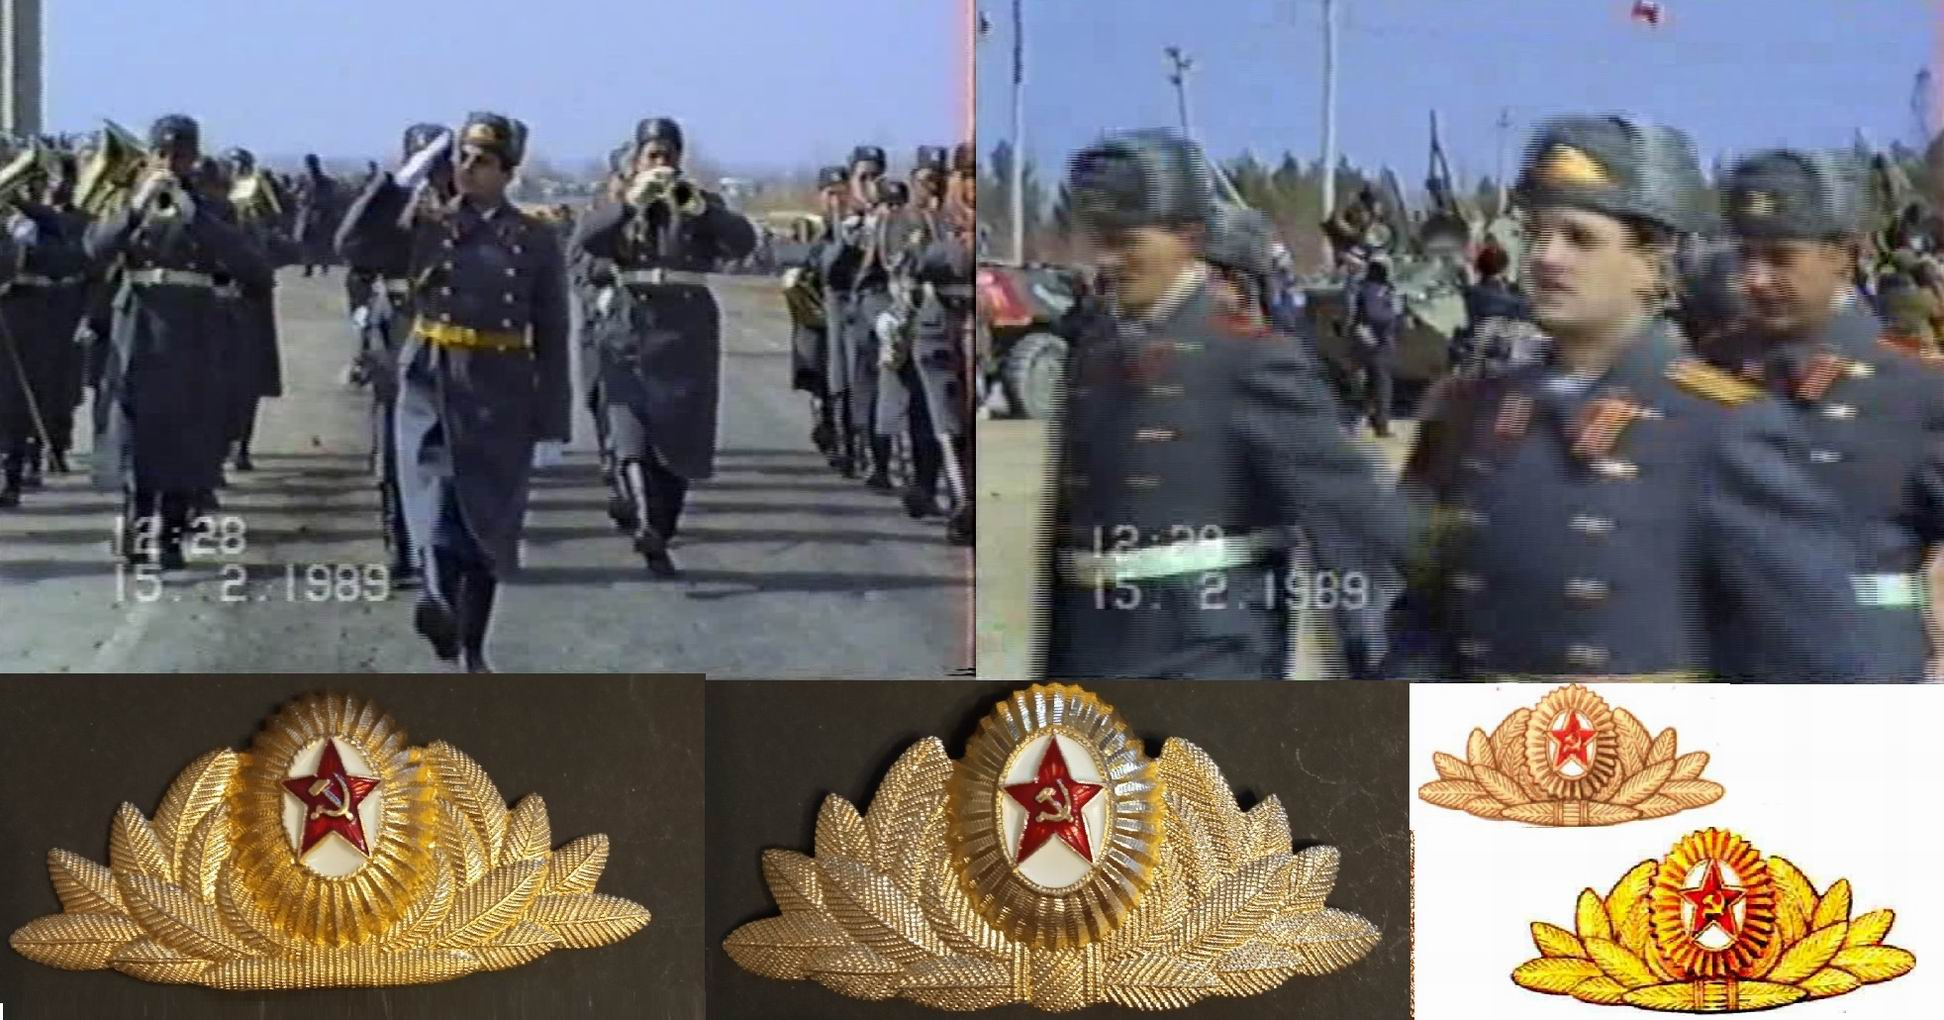 Внизу слева - обр.1969. По центру - обр. 1975г. Справа - рисунки кокарды из Правил ношения 1969 и 1988гг.